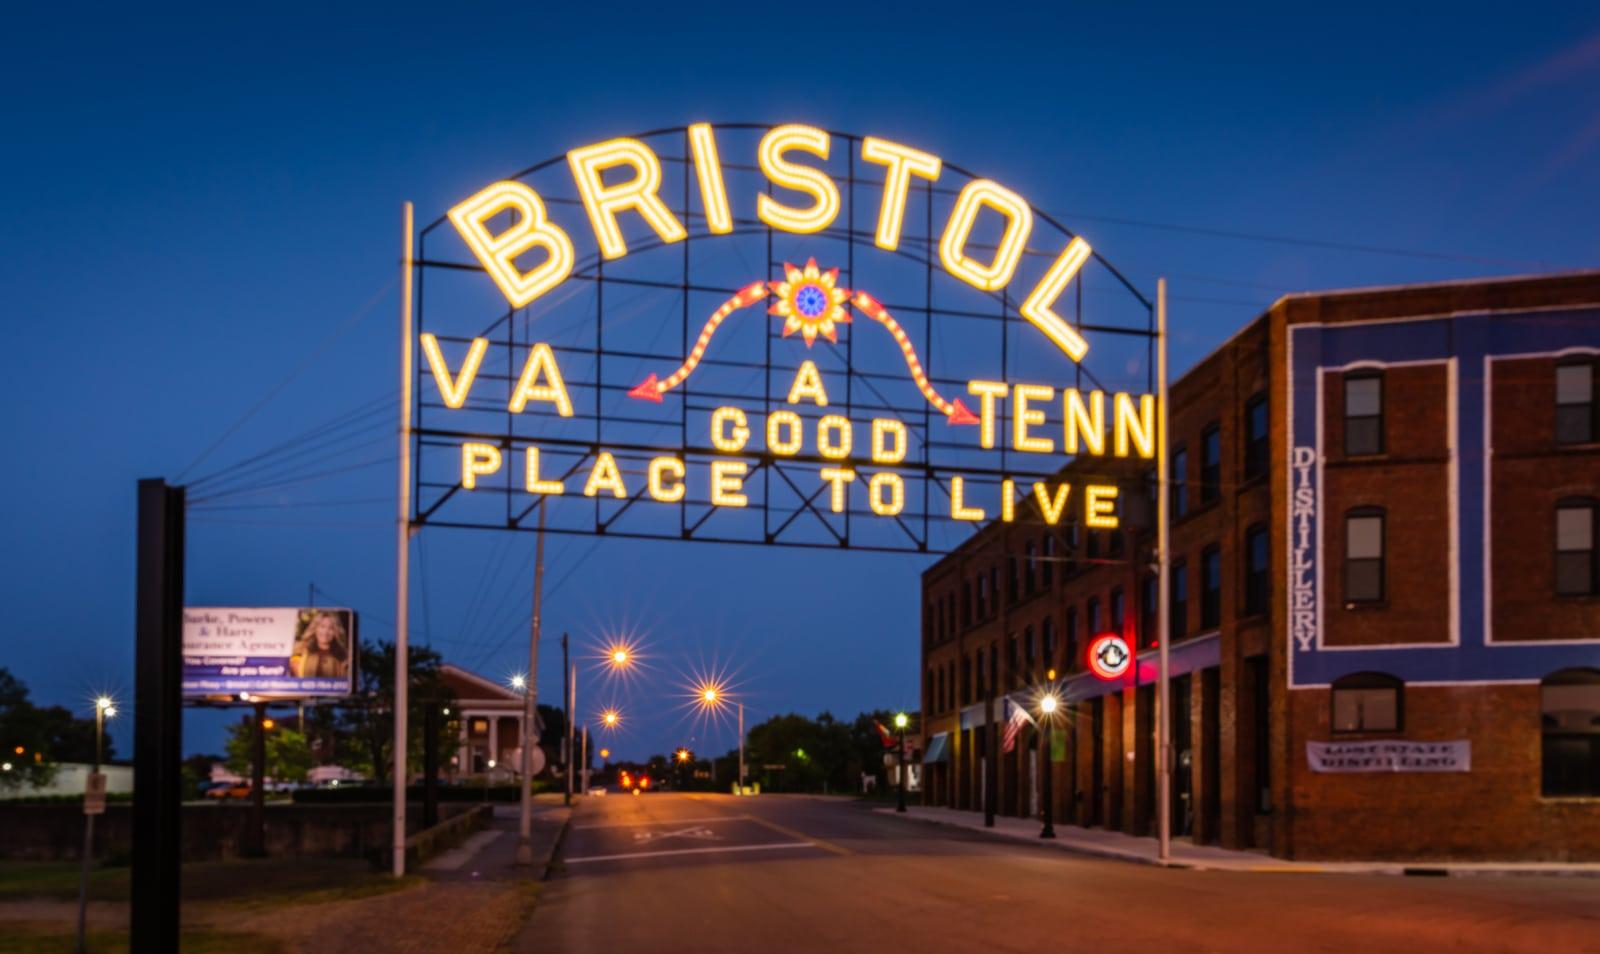 Bristol VA - Tenn - A Good Place to Live Neon Sign